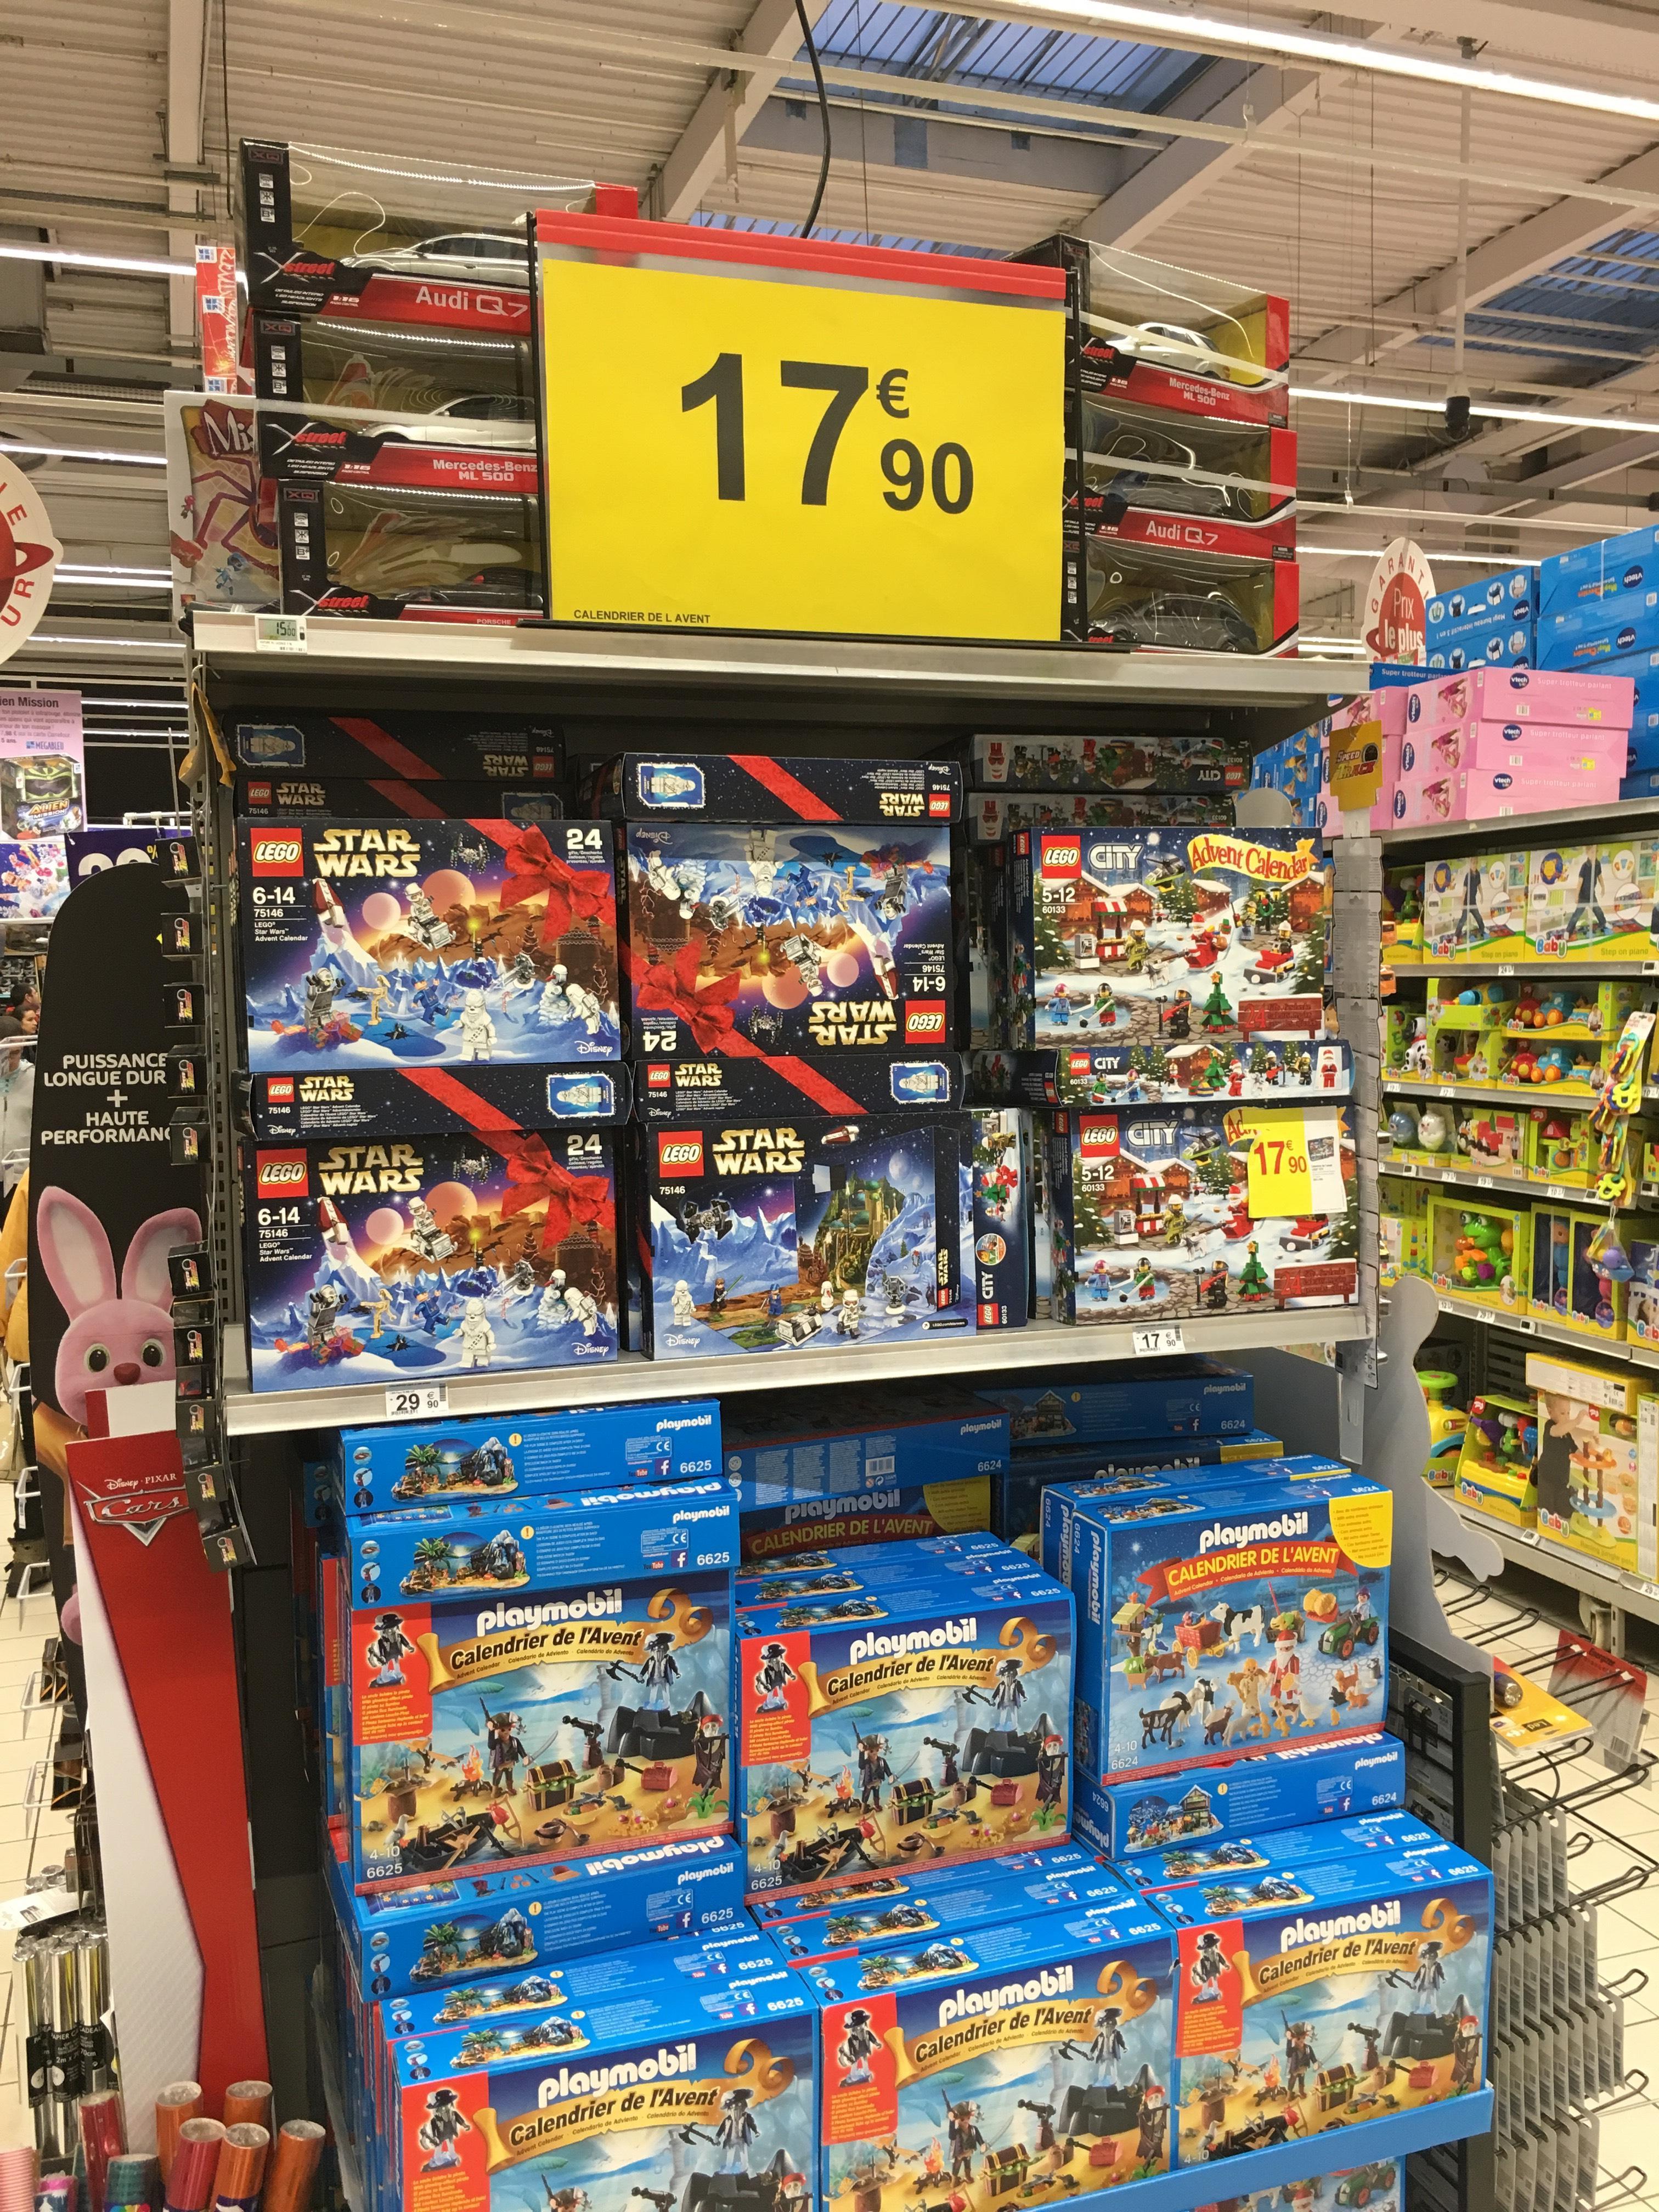 Calendrier de l'avent Lego City, Lego Star Wars ou Playmobilà